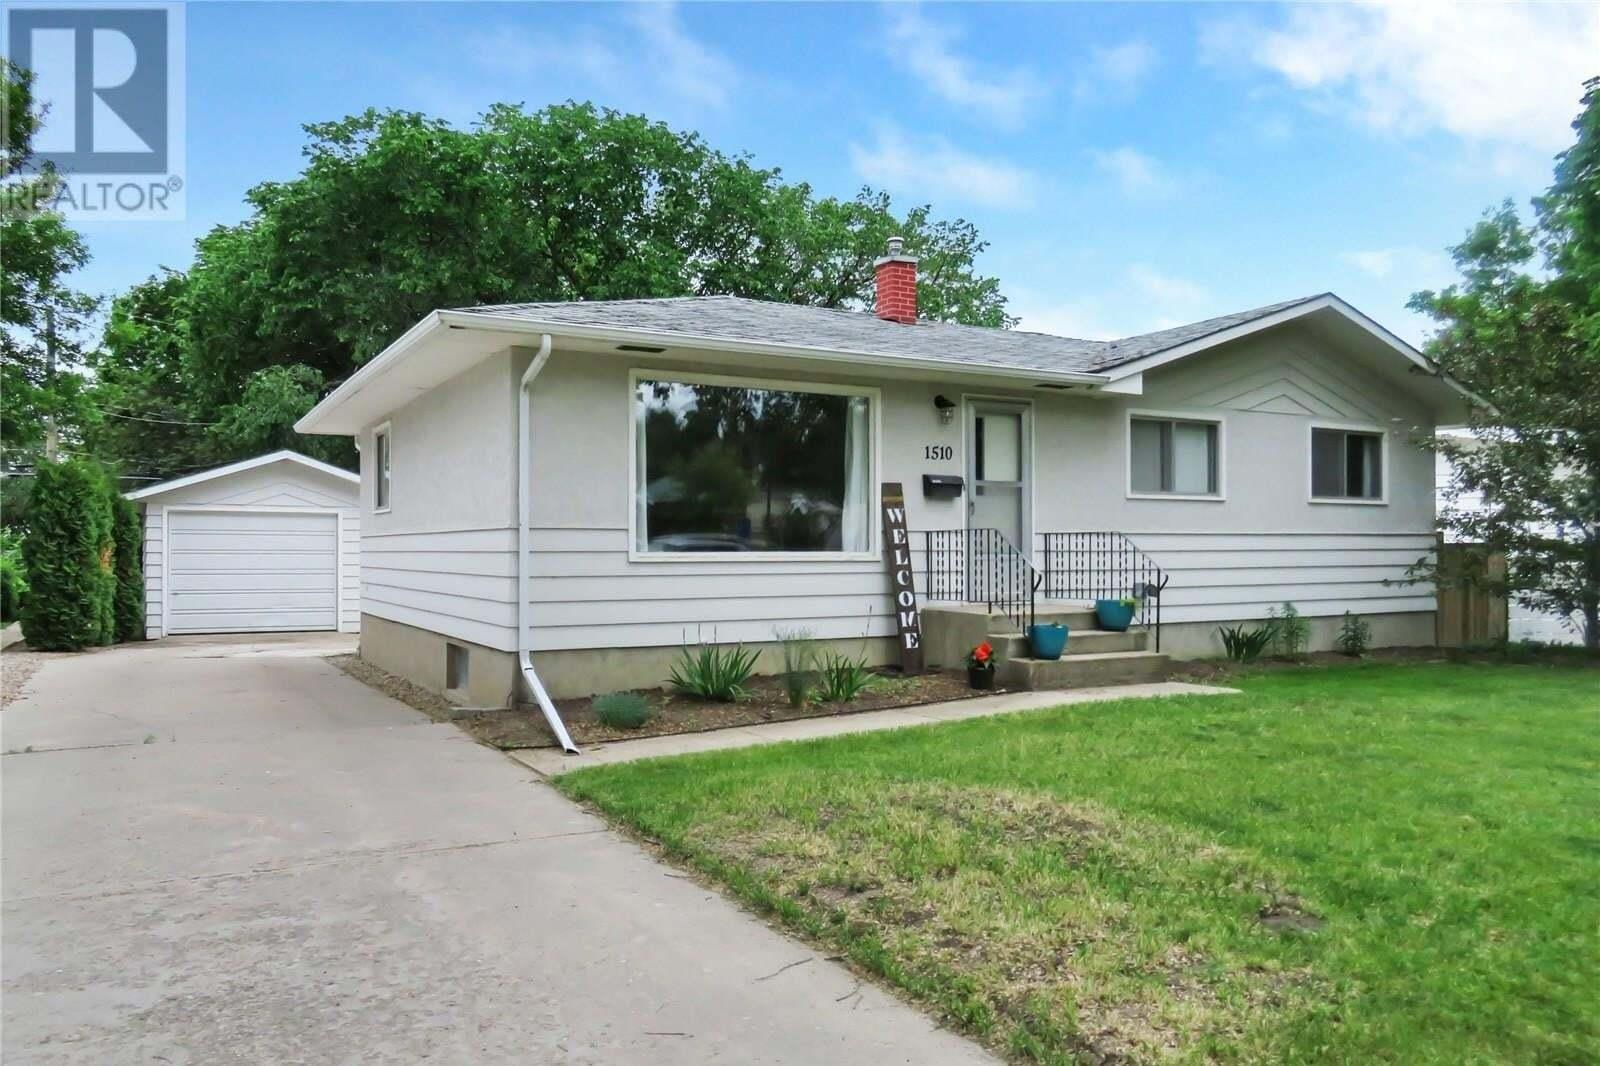 House for sale at 1510 Bell St E Swift Current Saskatchewan - MLS: SK814006